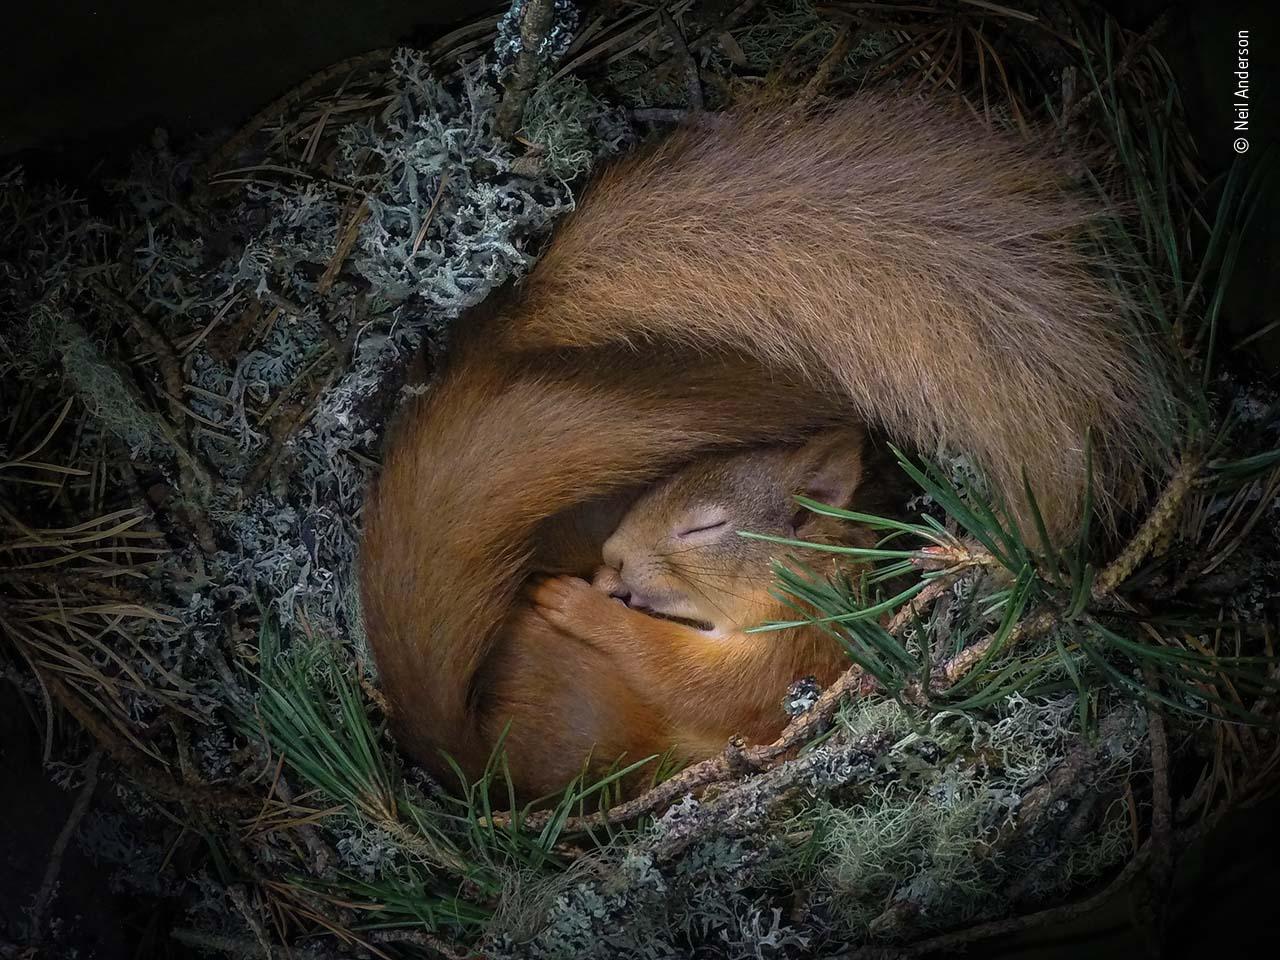 Neil Parkinson / Wildlife Photographer of the Year